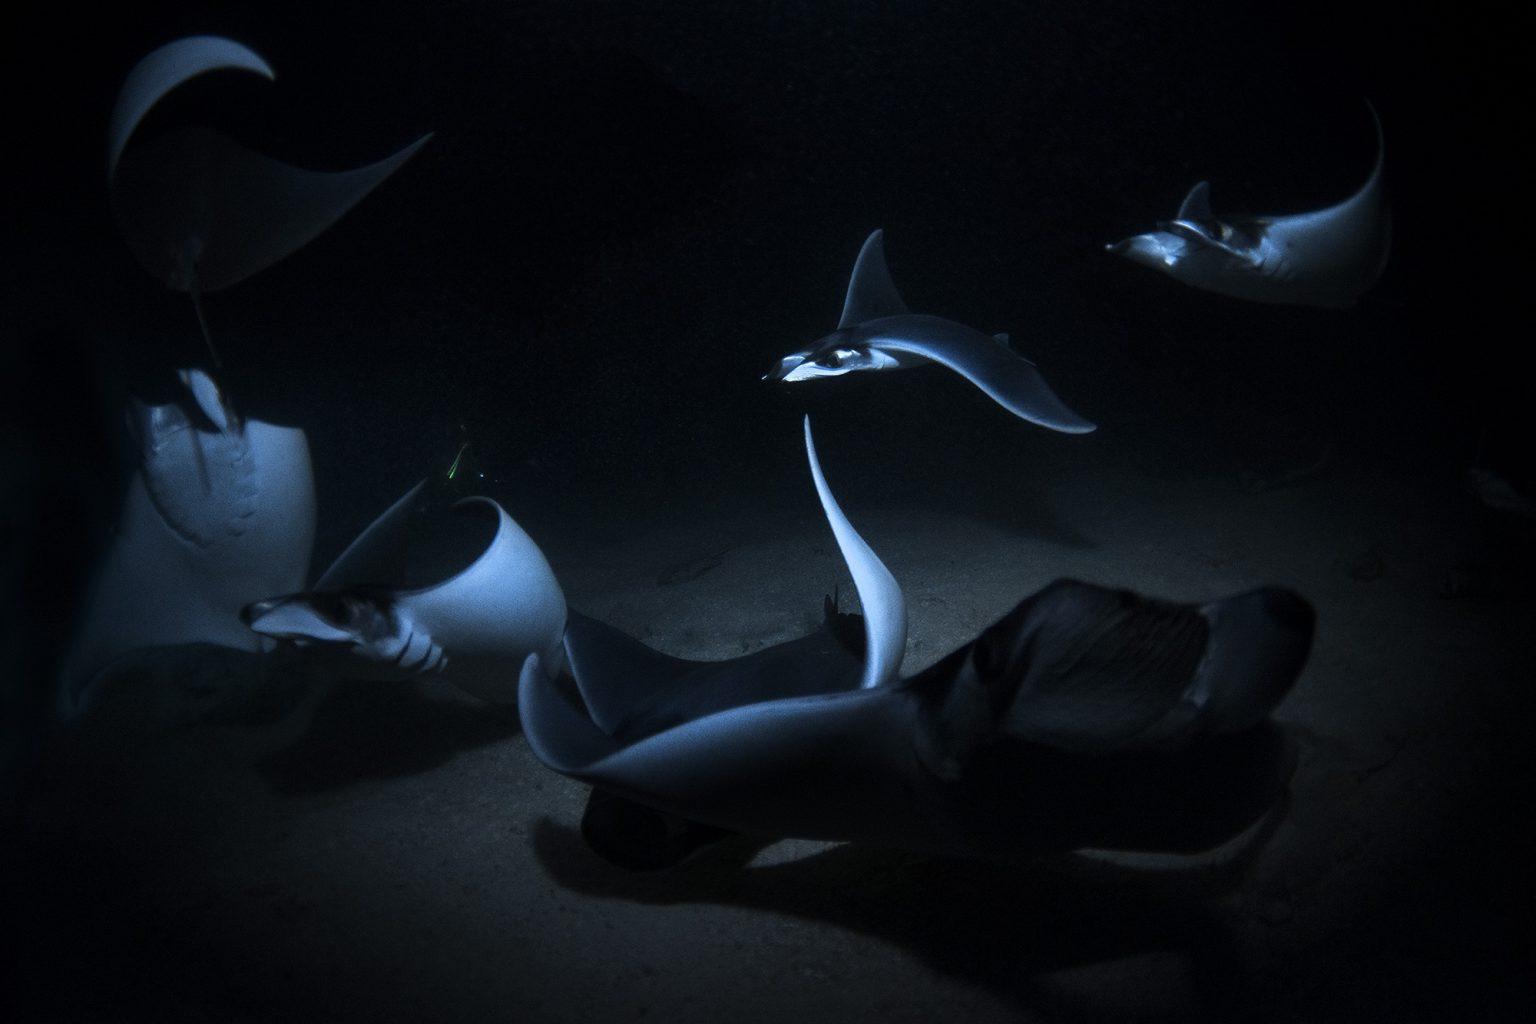 Mobula Night Dive at Isla Espiritu Santo, Sea of Cortez, Mexico